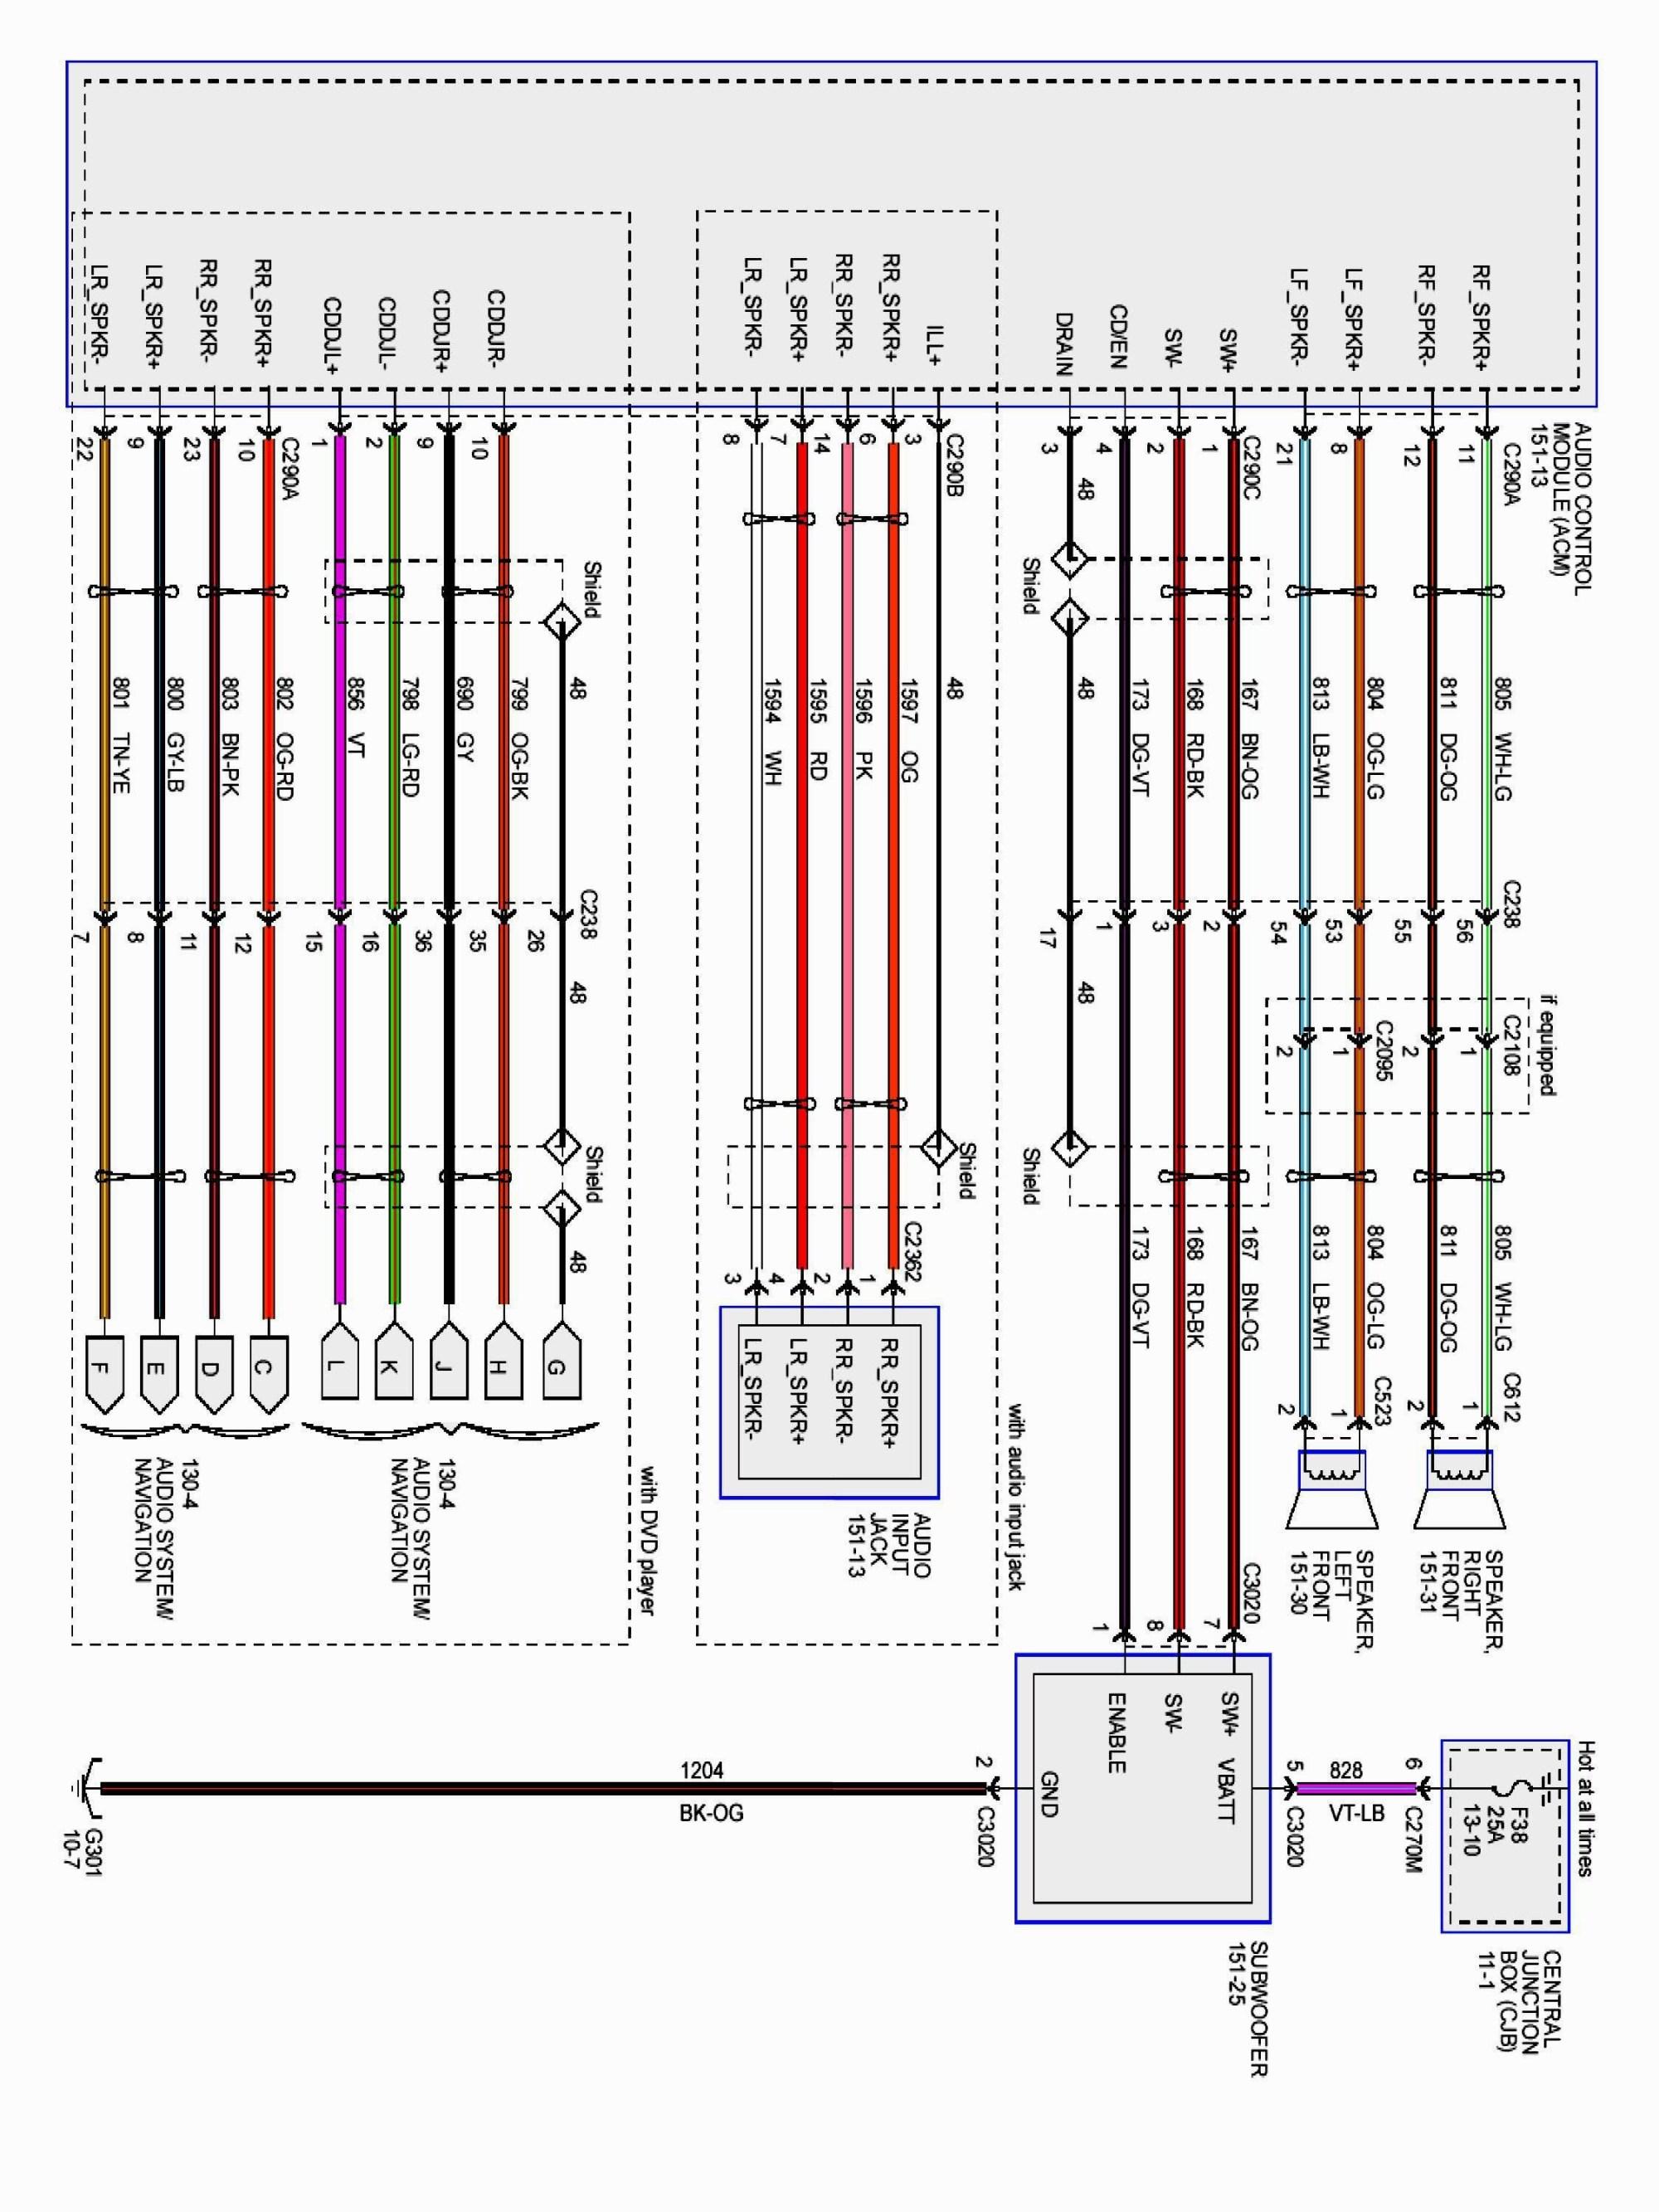 hight resolution of ford radio wiring harness diagram new ford radio wiring harness diagram diagram of ford radio wiring ford radio wiring harness diagram 87 camaro